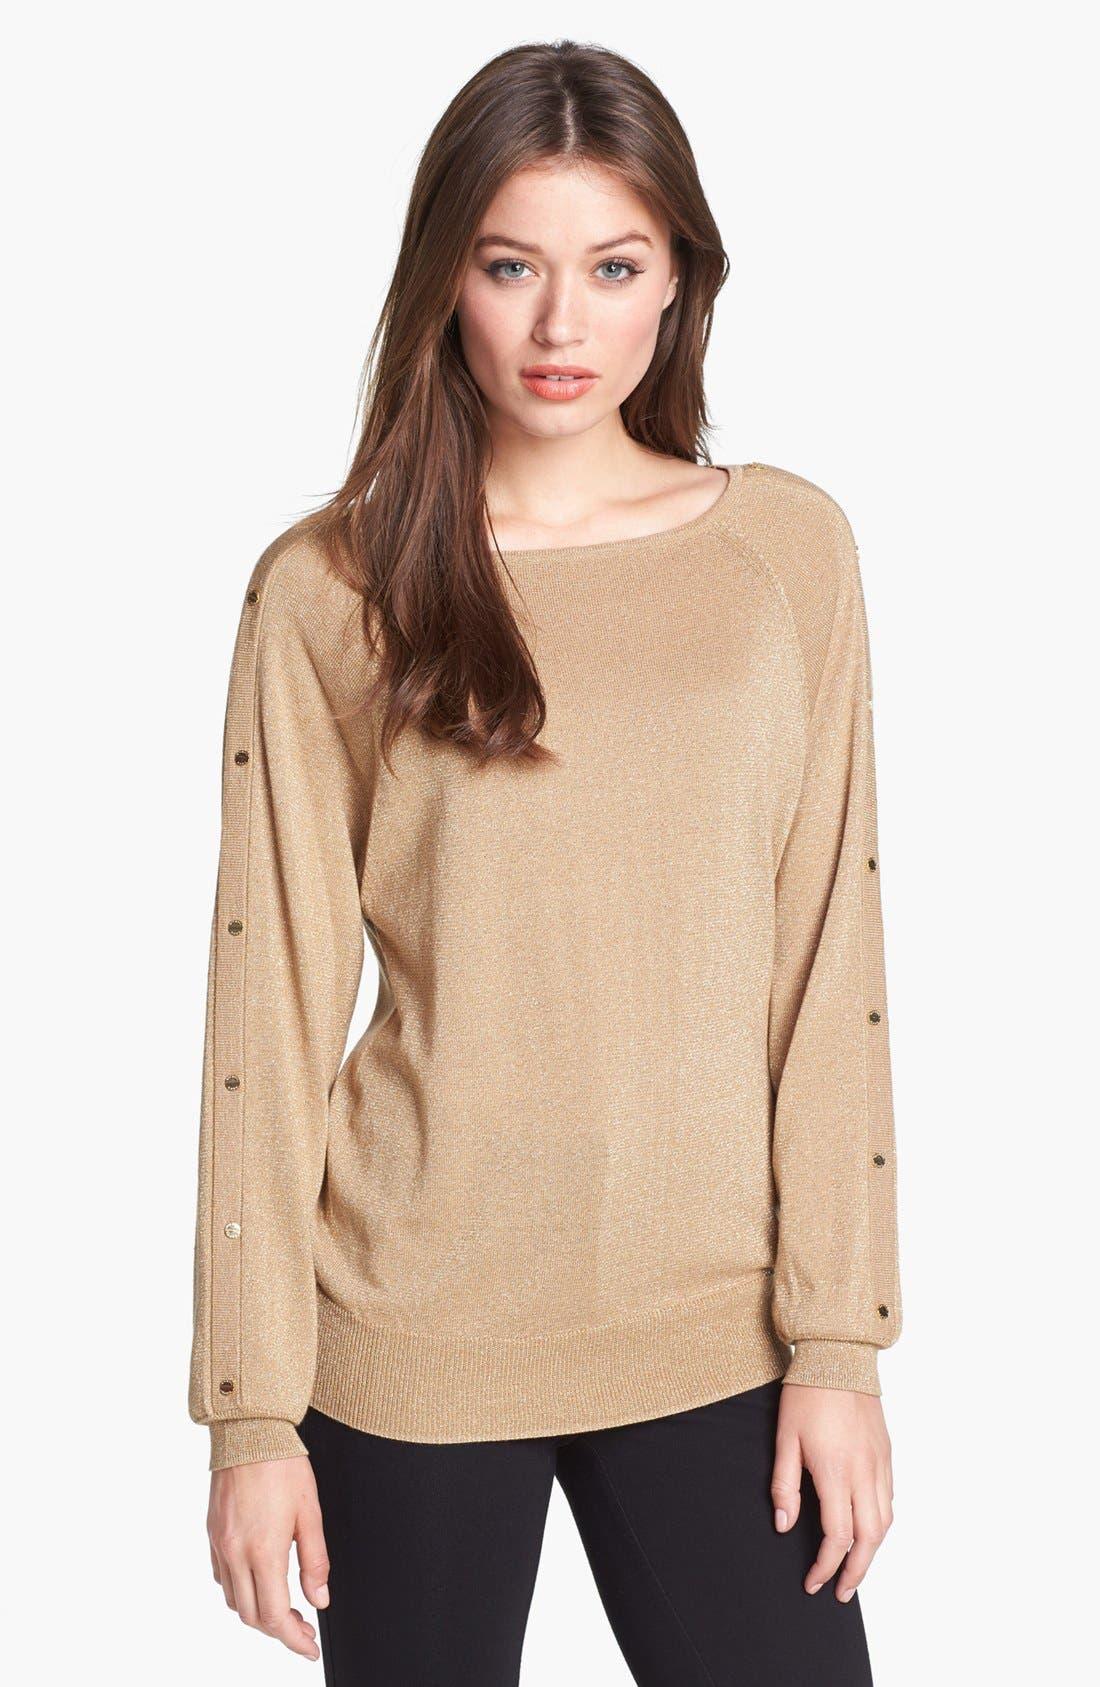 Alternate Image 1 Selected - MICHAEL Michael Kors Studded Sleeve Metallic Sweater (Petite)